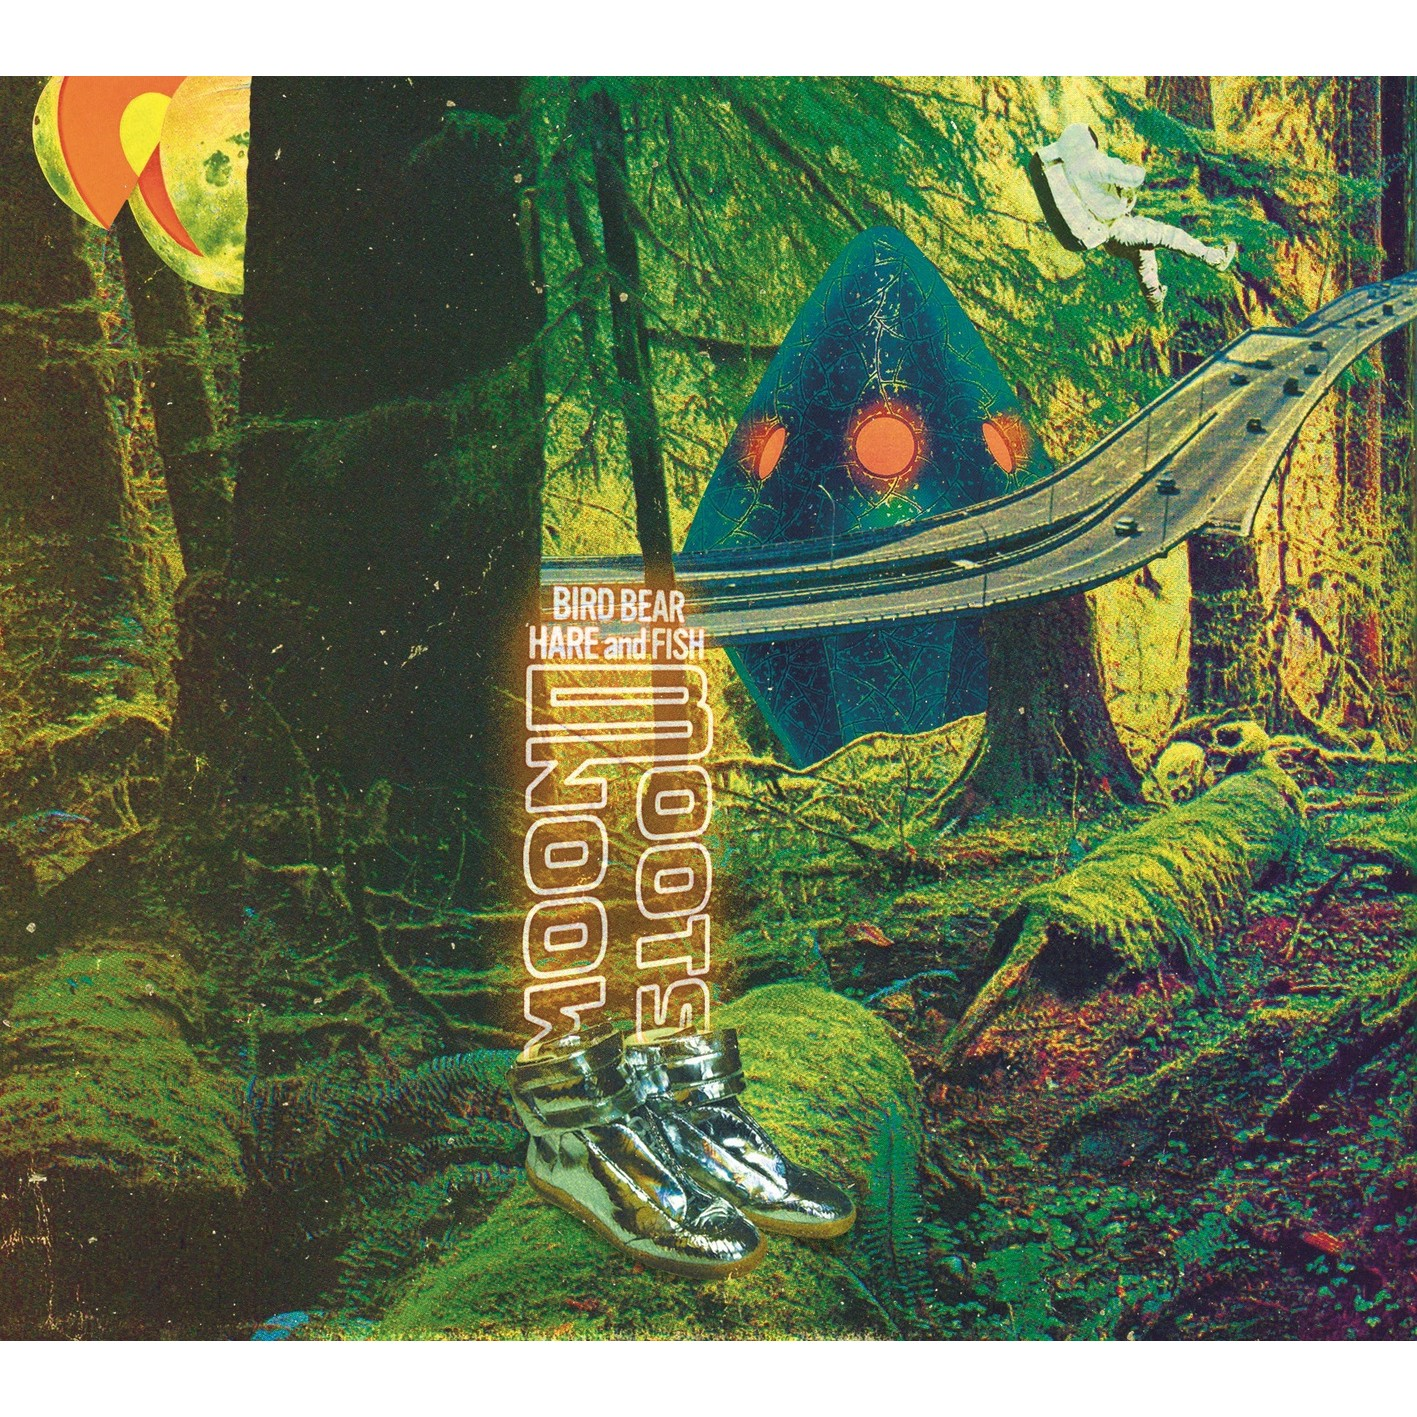 Bird Bear Hare and Fish – Moon Boots [24bit Lossless + MP3 320 / WEB]  [2018.09.05]